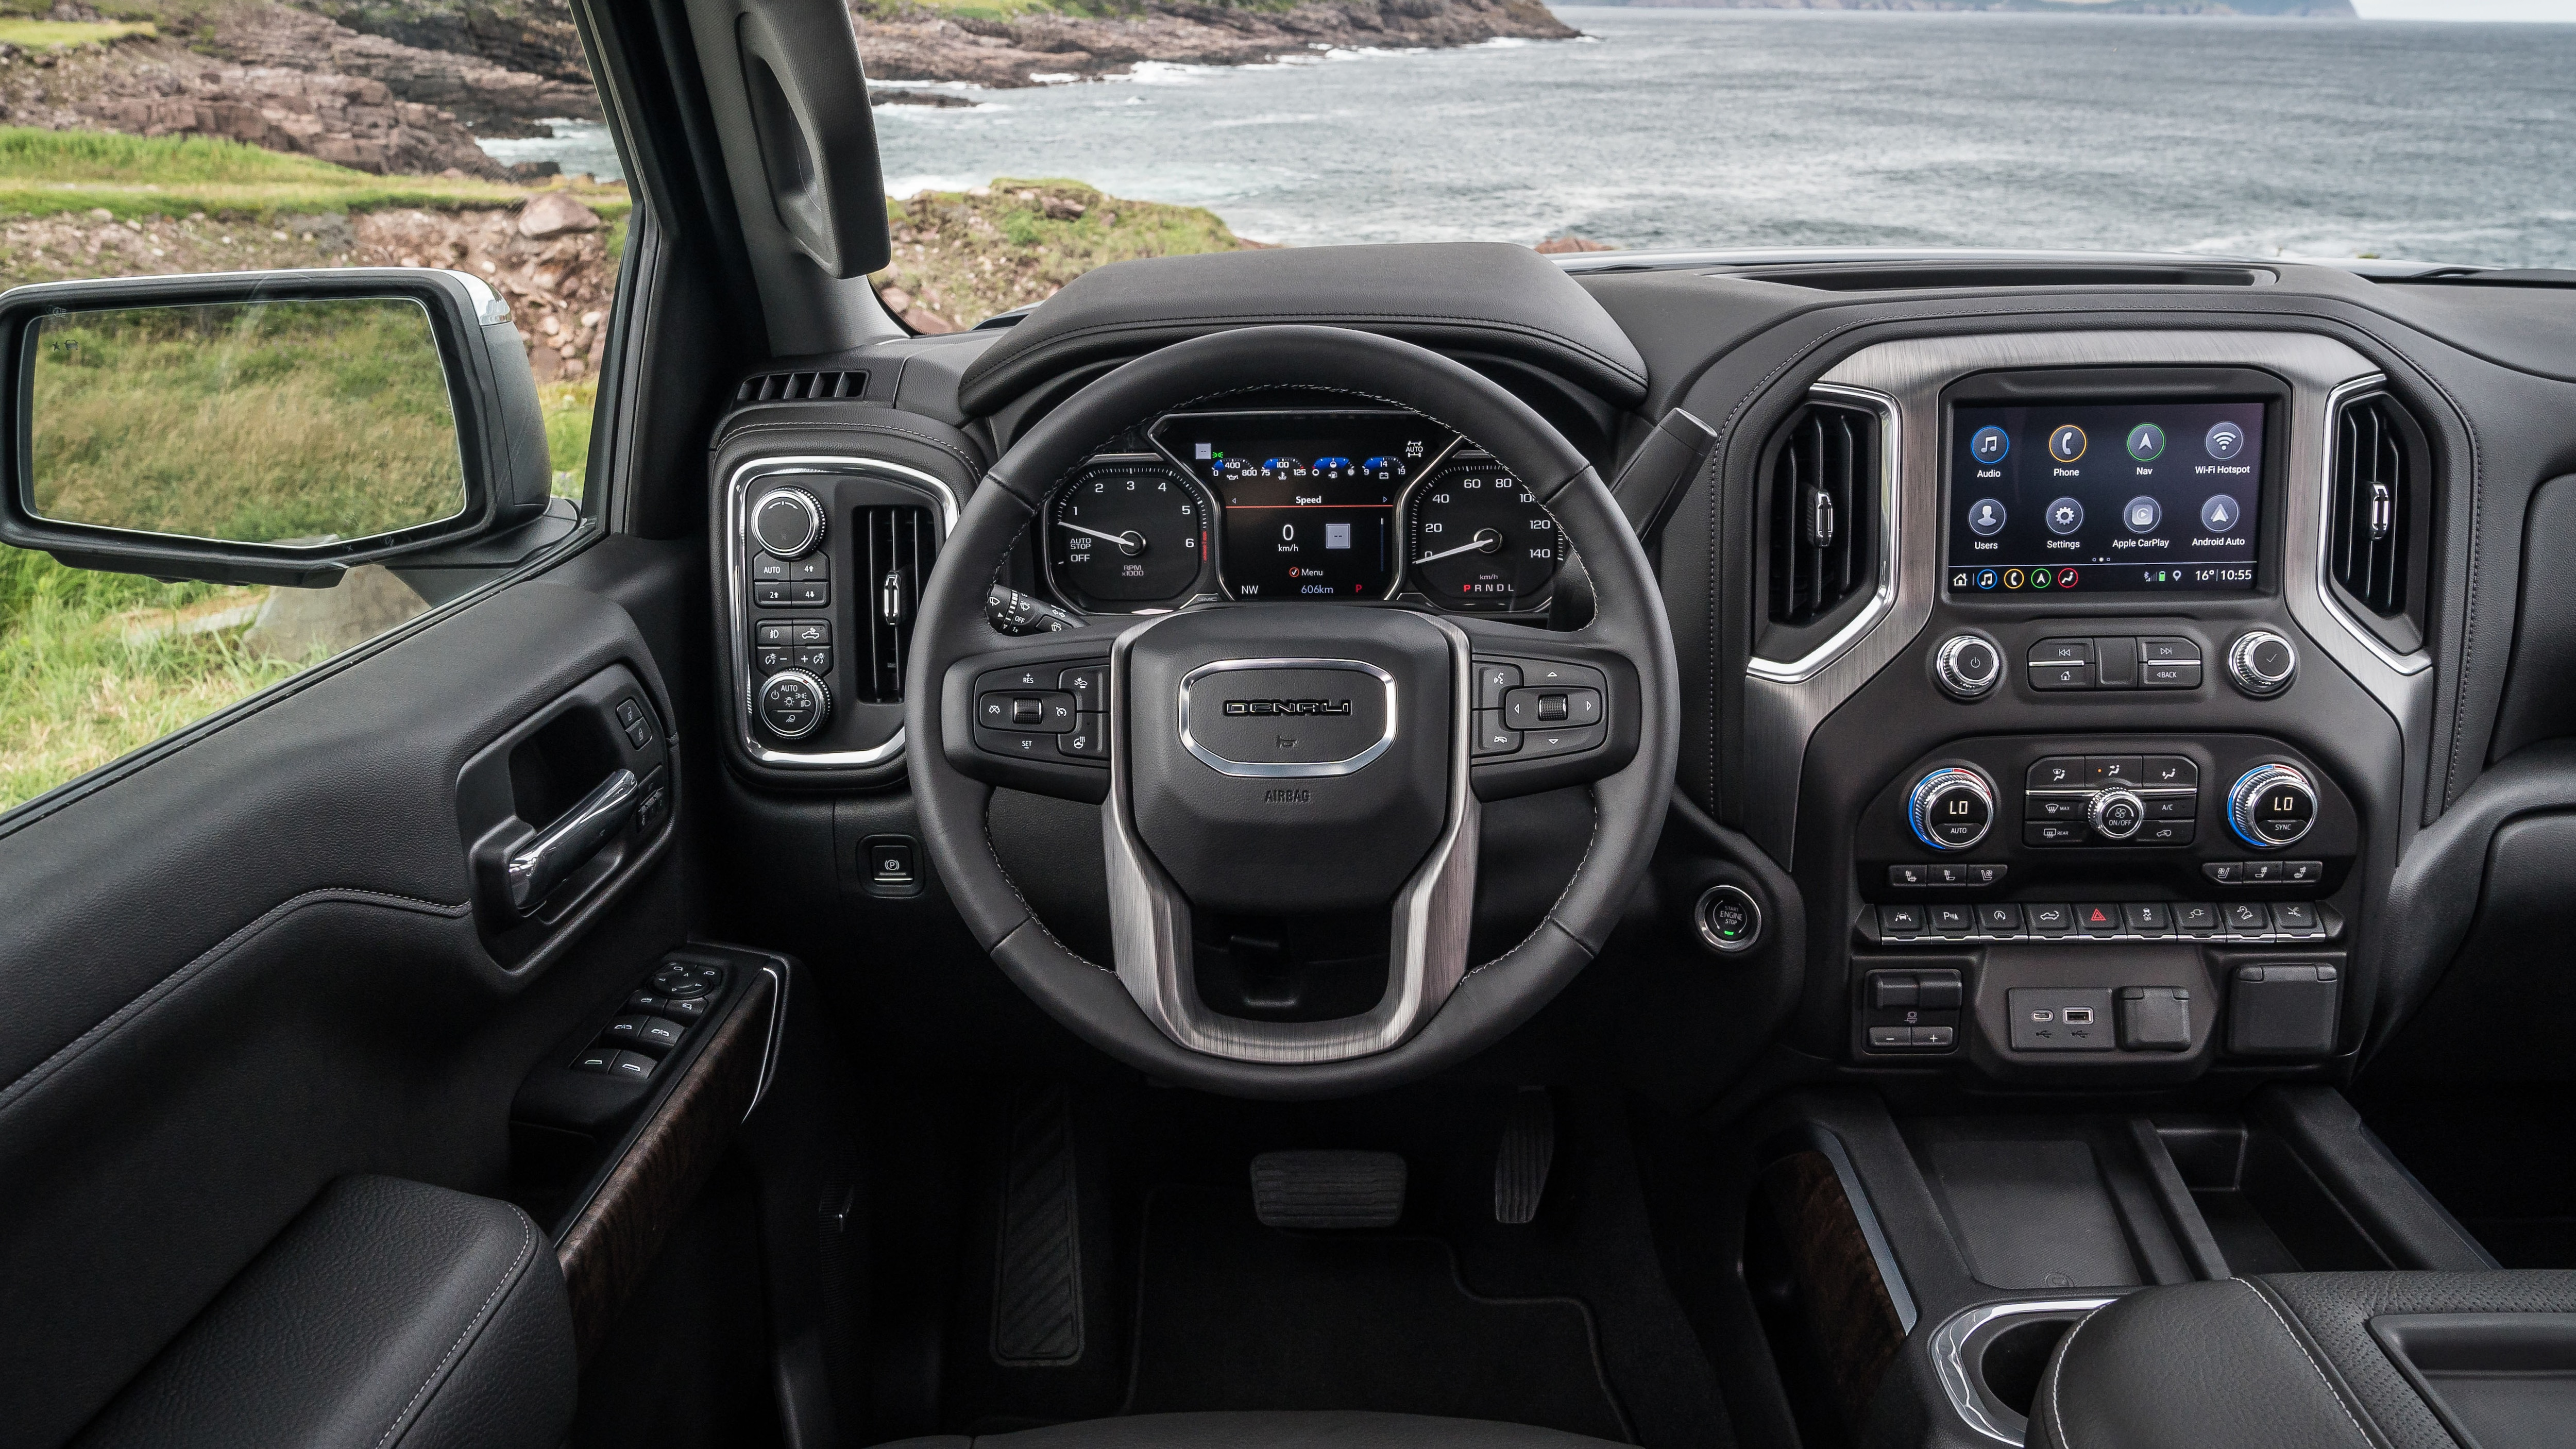 2019 GMC Sierra 1500 Denali First Drive Review ...